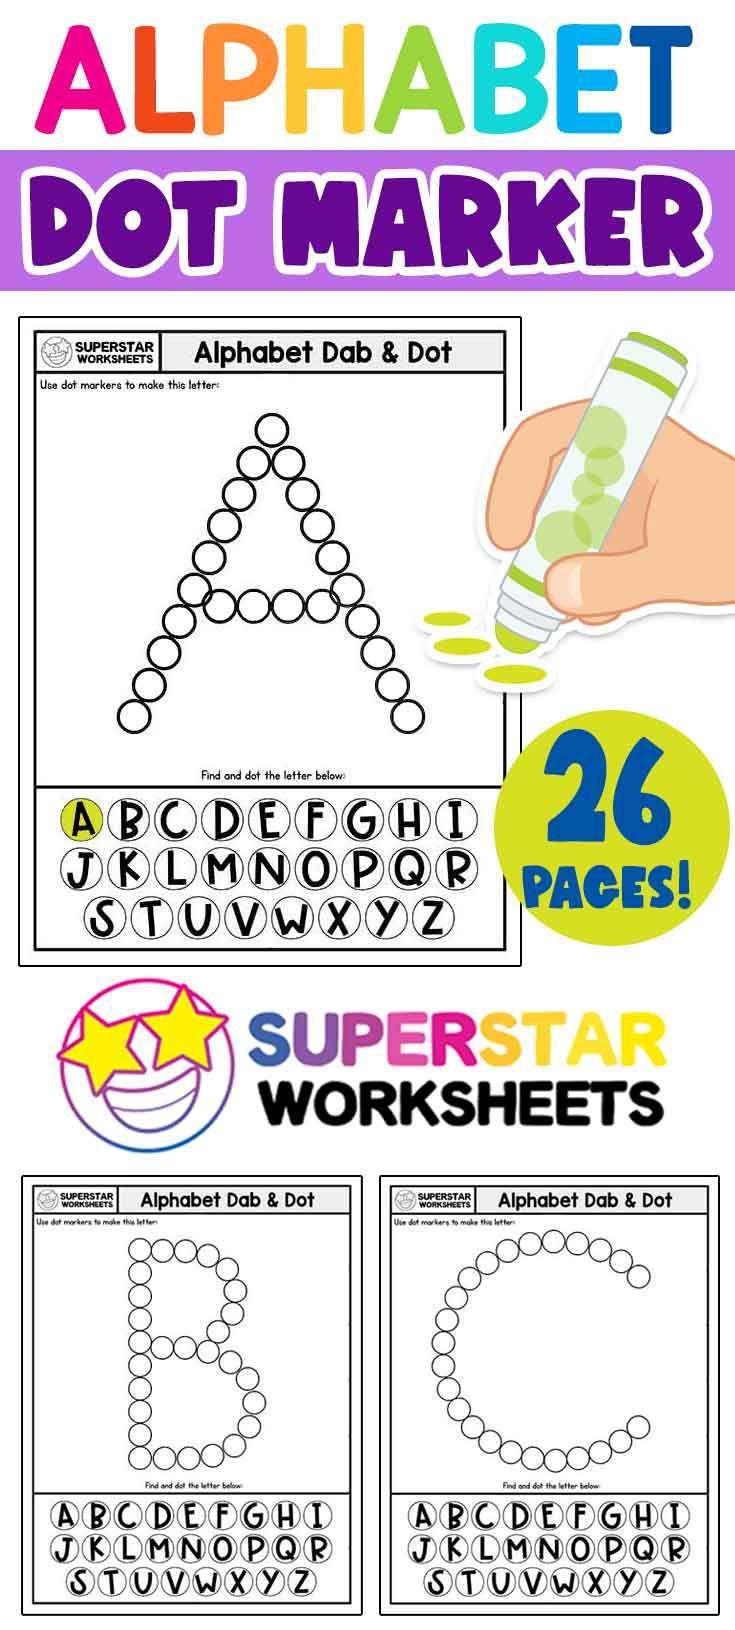 Alphabet Worksheets Dot Marker Activity Pages Free Alphabet Worksheets For Letter Recognition Letter Recognition Worksheets Dot Marker Activities Dot Markers [ 1630 x 735 Pixel ]